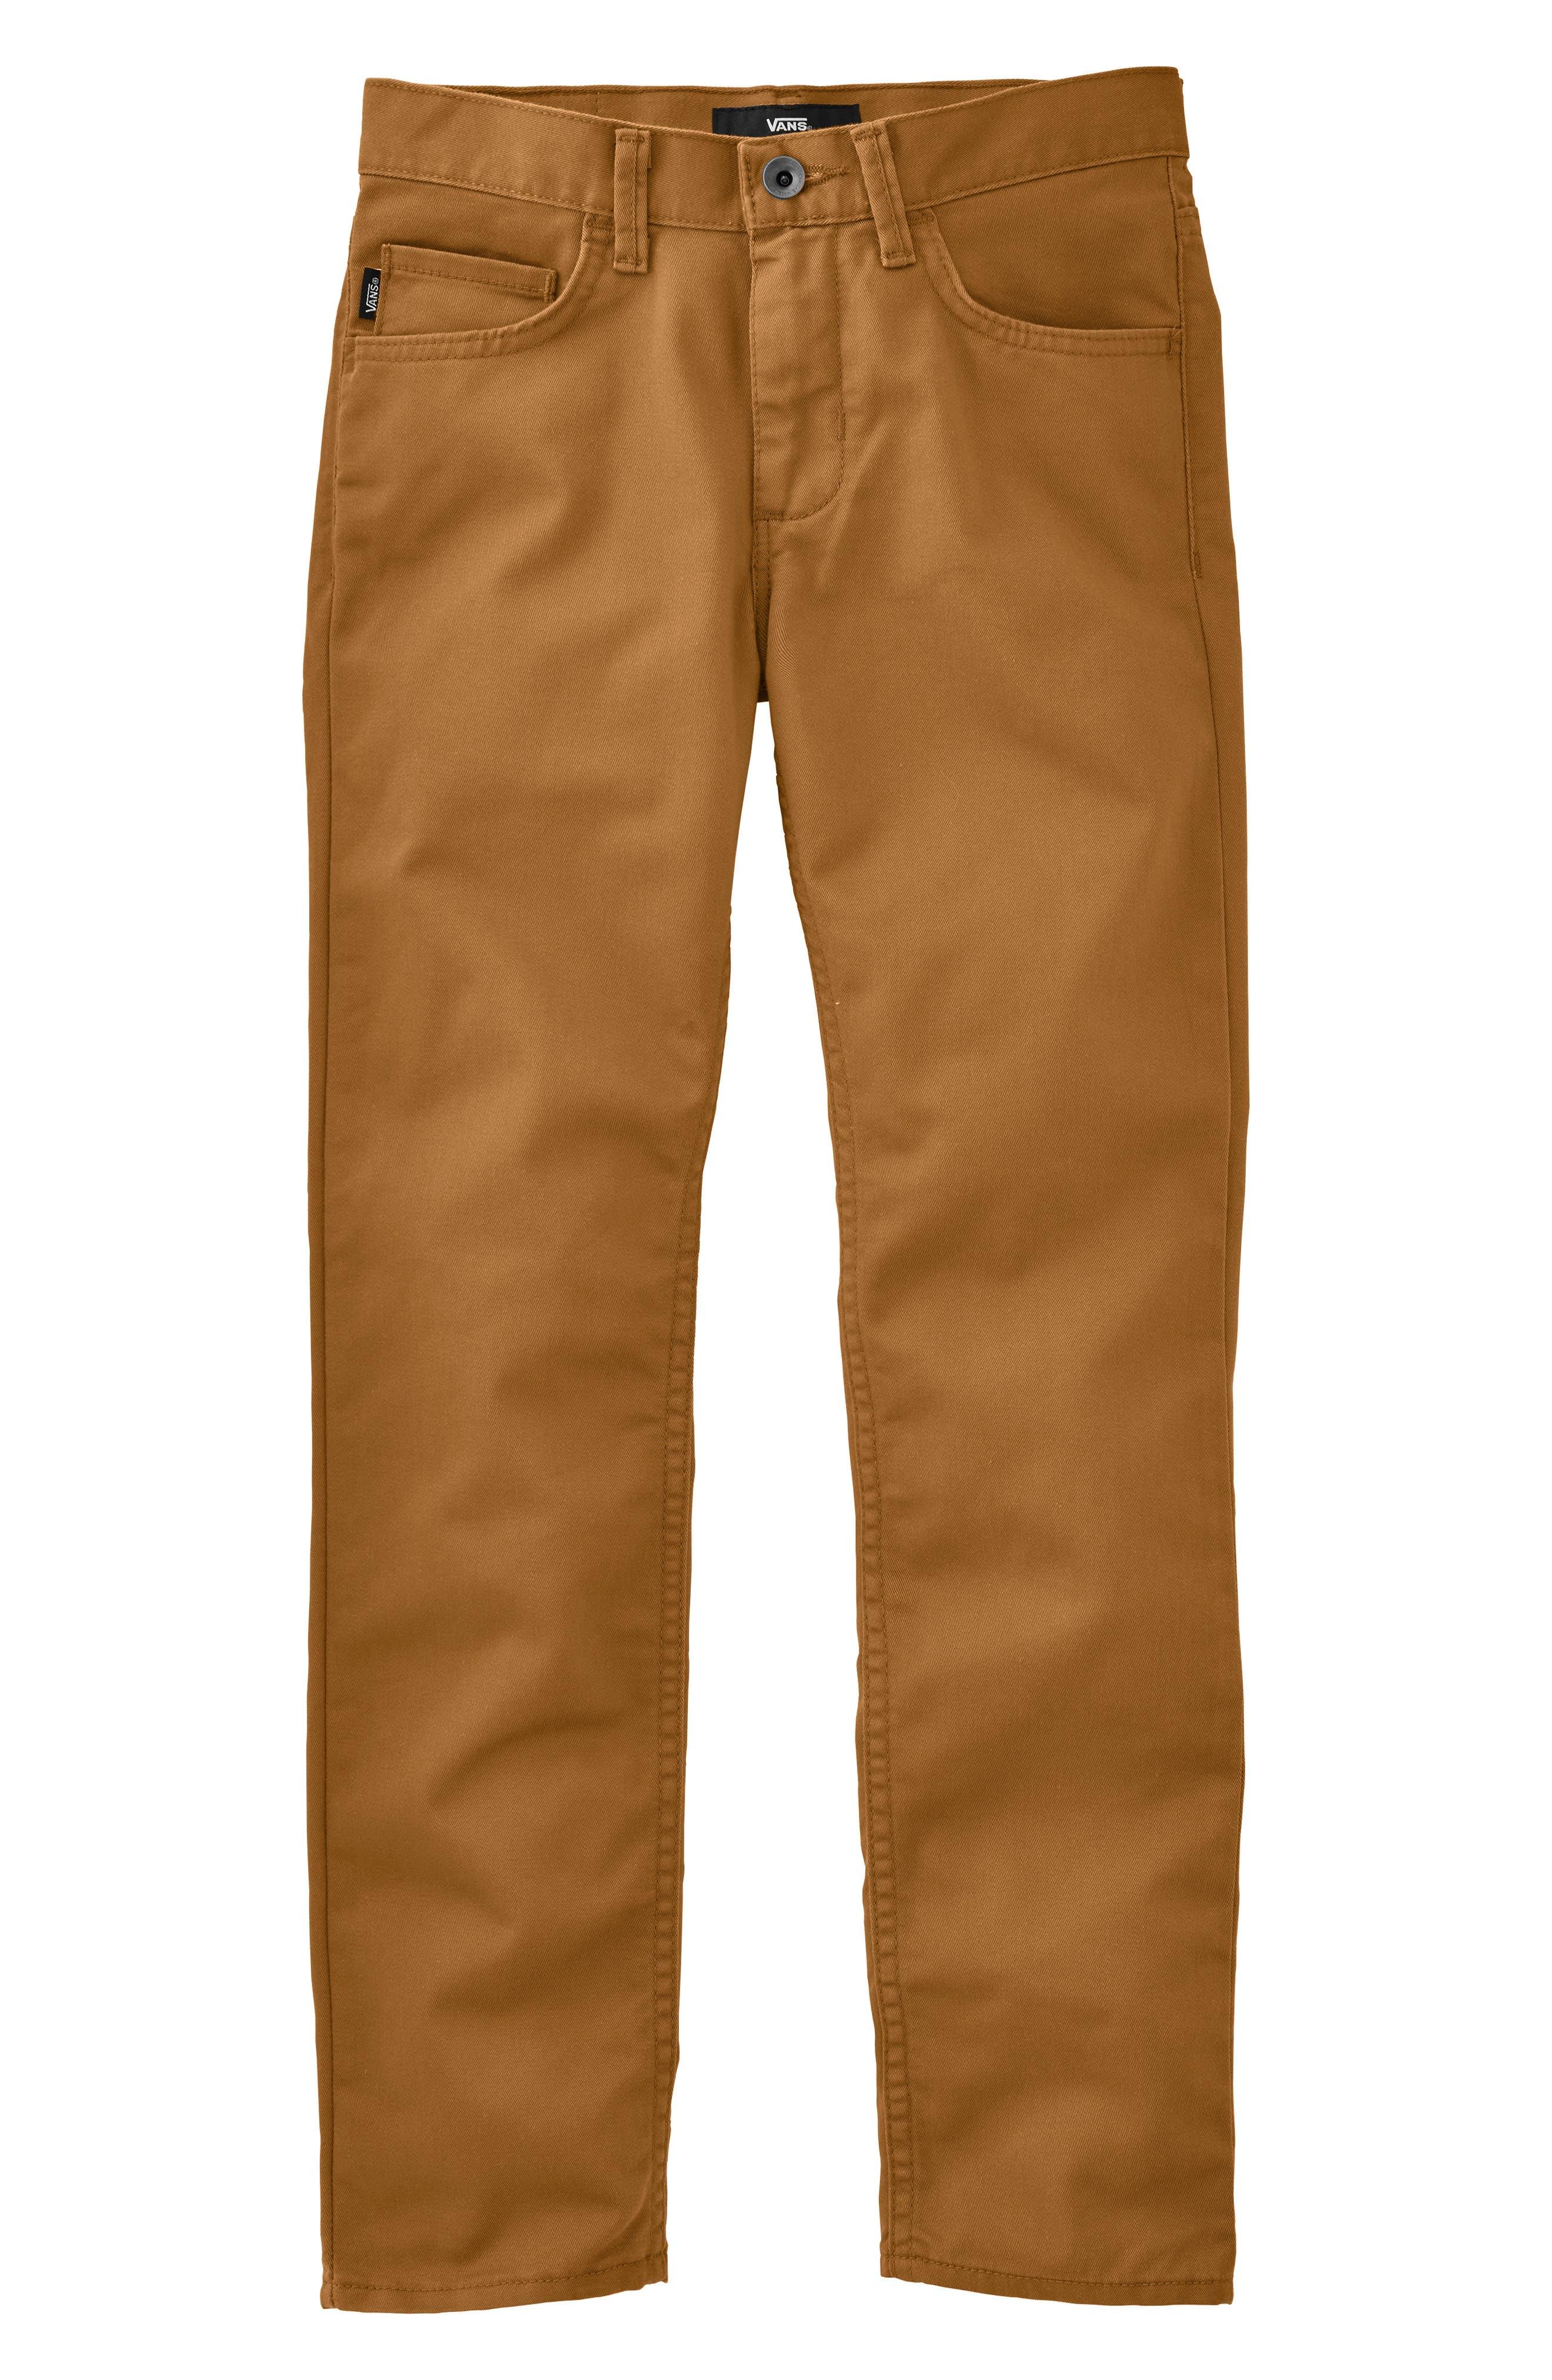 V56 Standard AV Covina II Pants,                             Main thumbnail 1, color,                             RUBBER